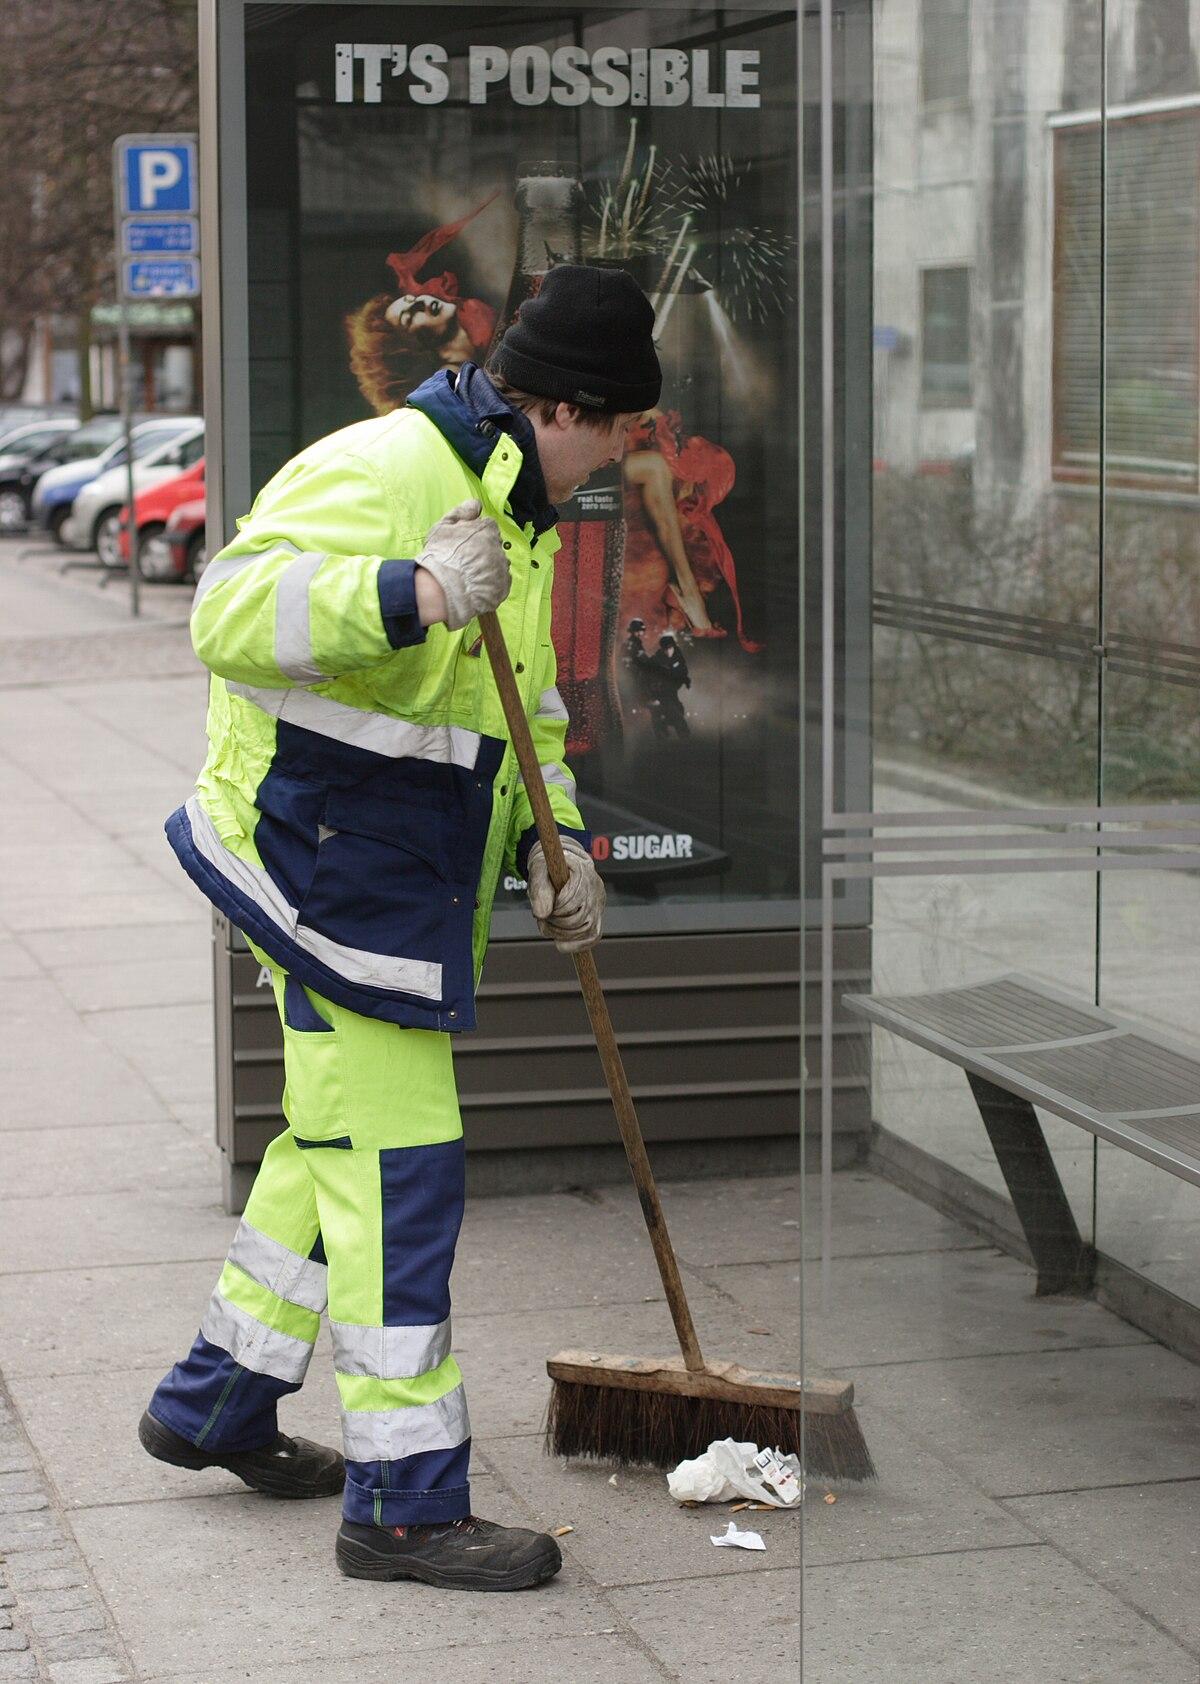 Gadefejer wikipedia den frie encyklop di - Pisos para una persona madrid ...